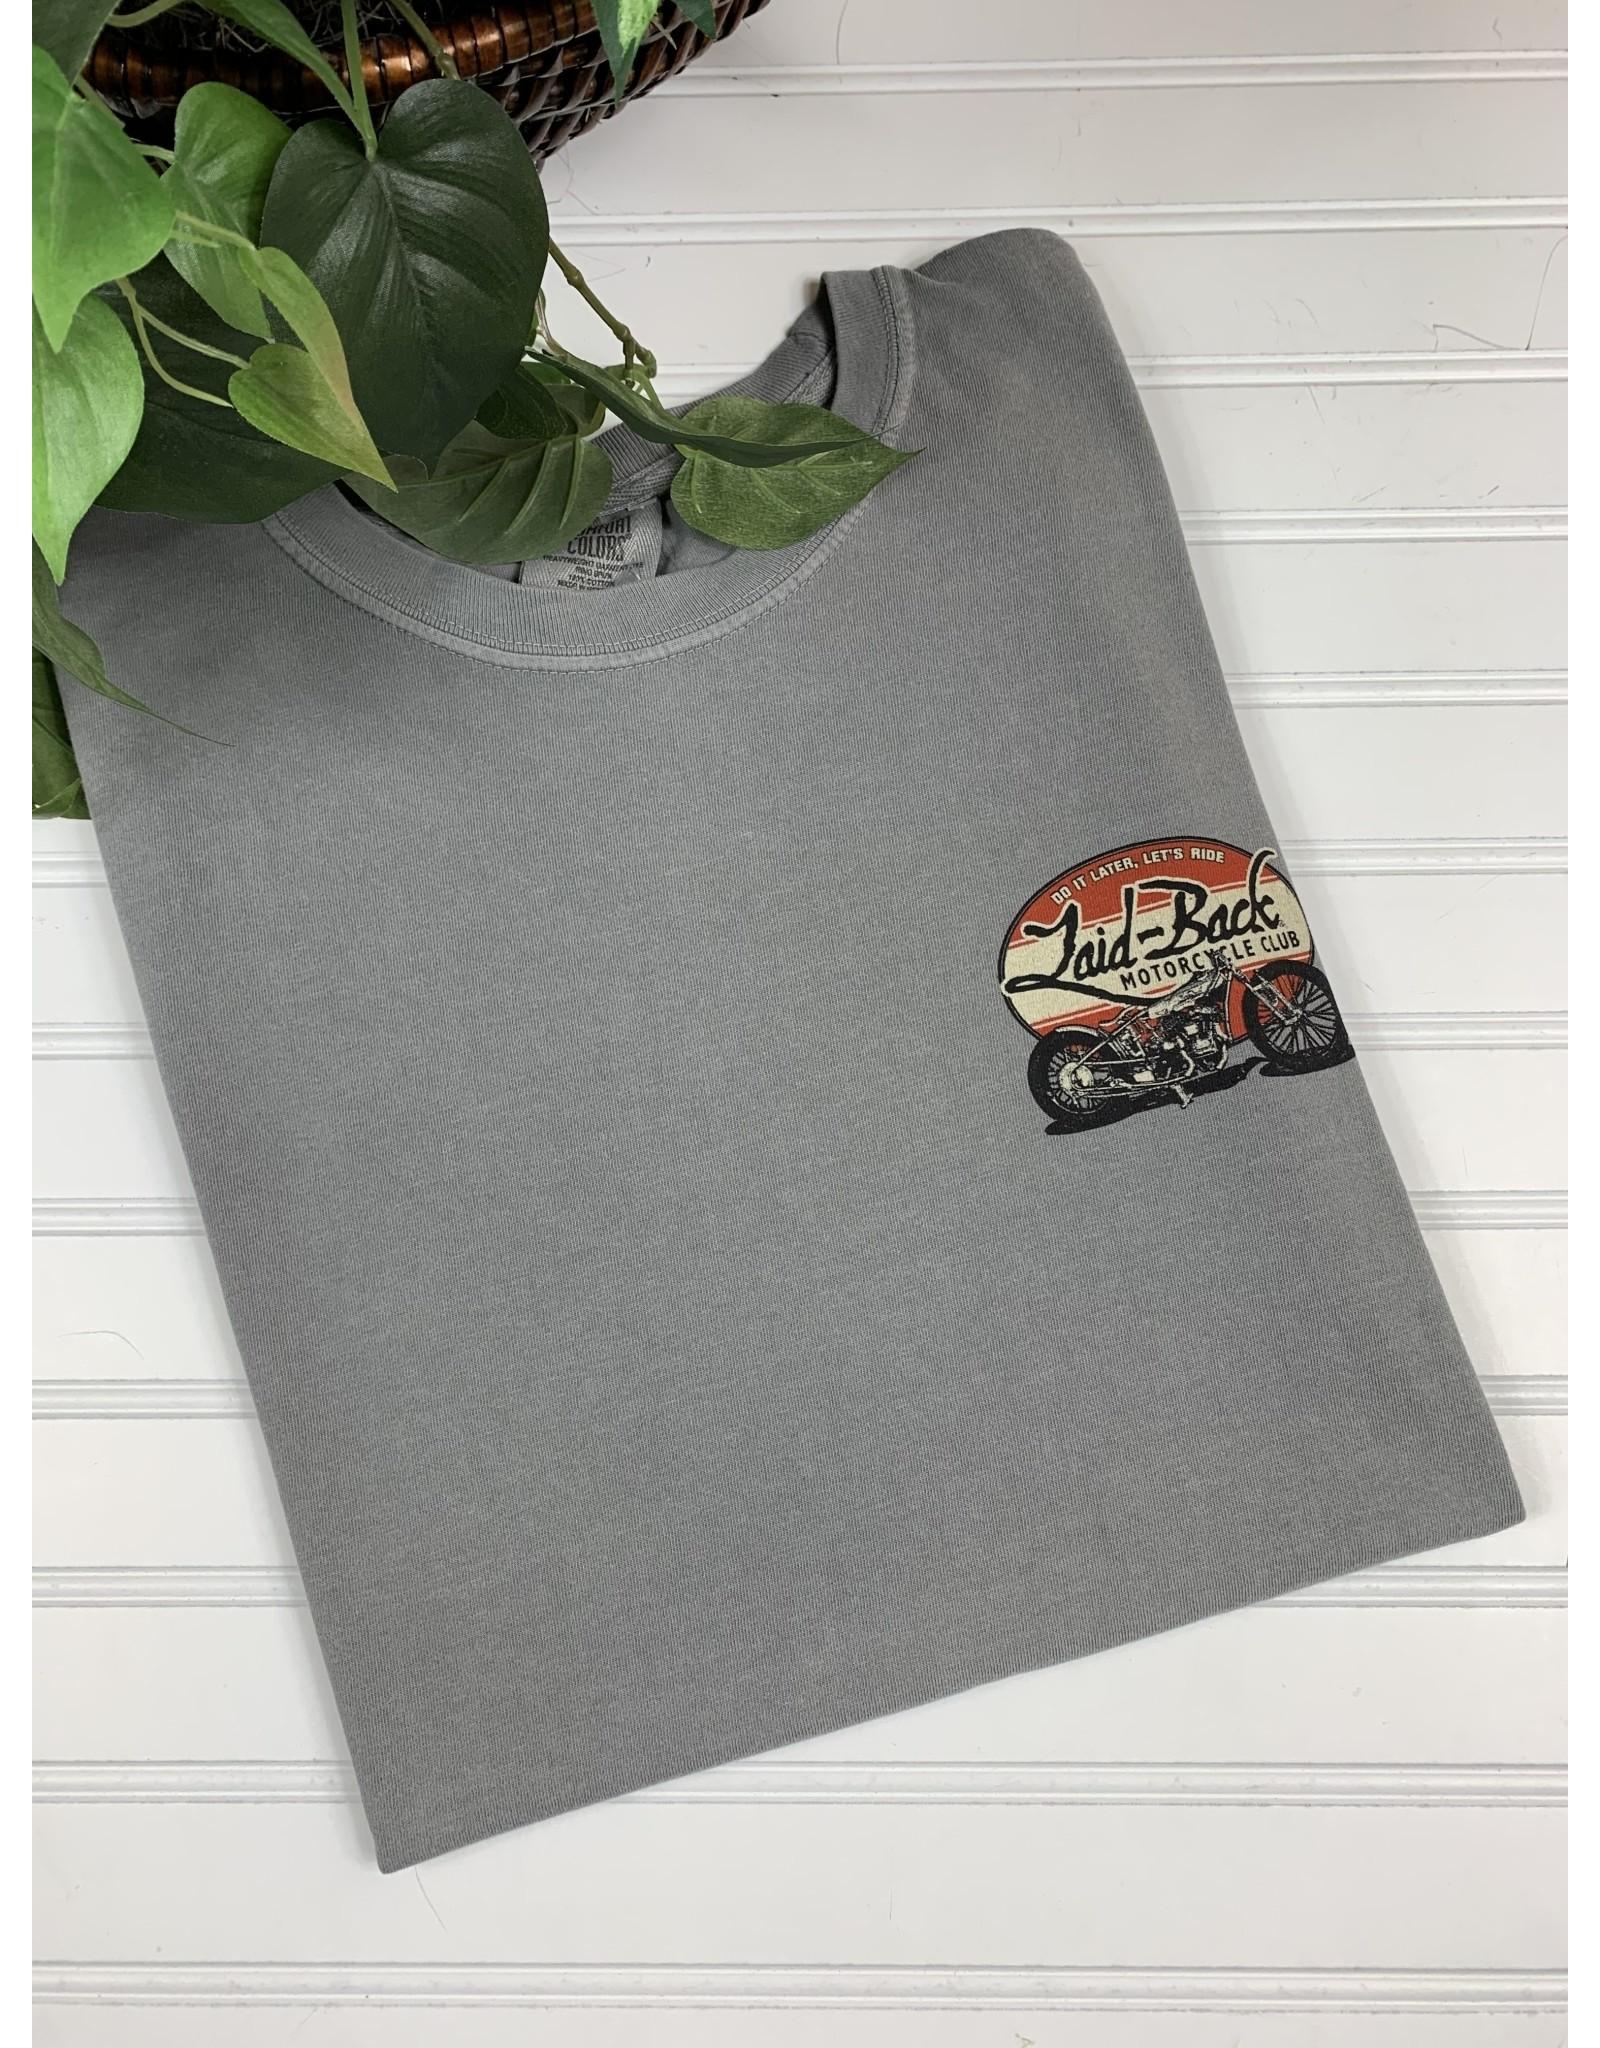 Laid Back Laid Back Indian Motorcycle T-Shirt